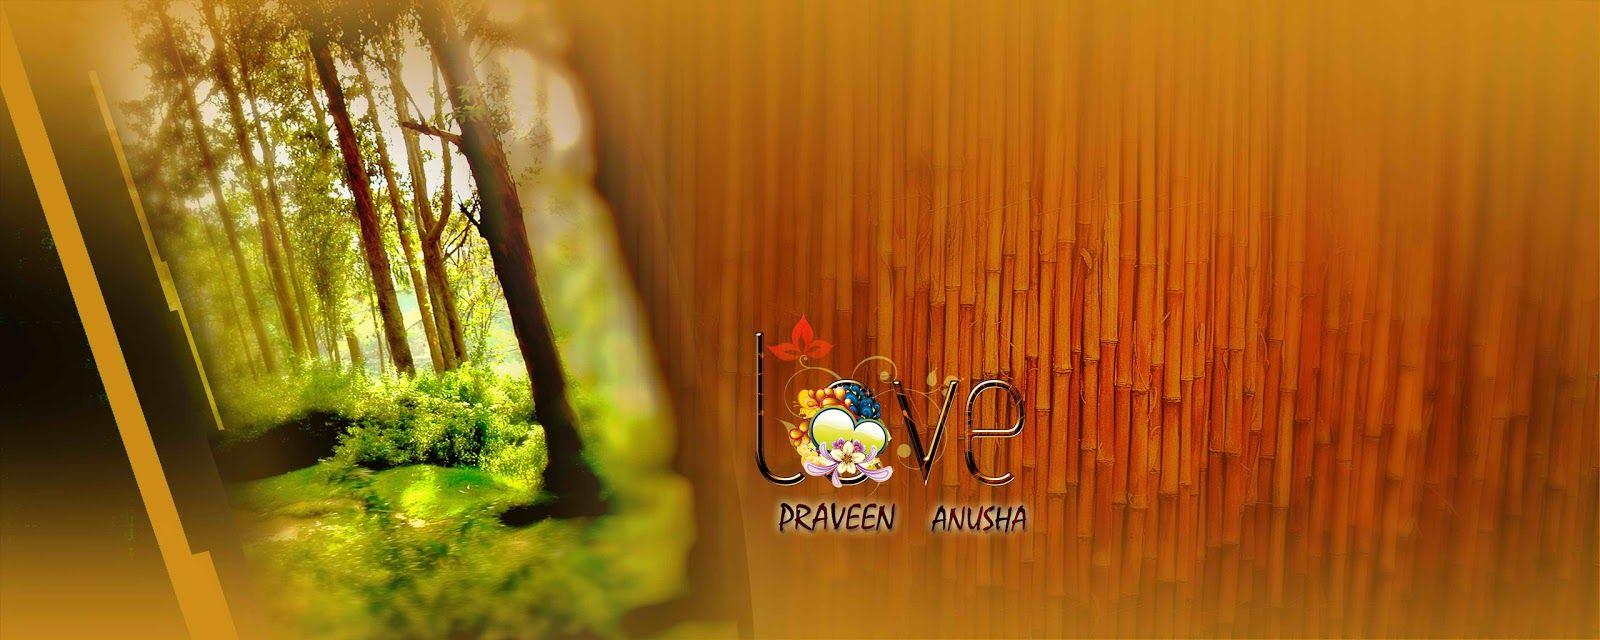 Karizma album hd joy studio design gallery best design - Top 8 Karizma Album Background Psd Files Free Download 12x36 Wedding Daywedding Photosbackground Designsalbum